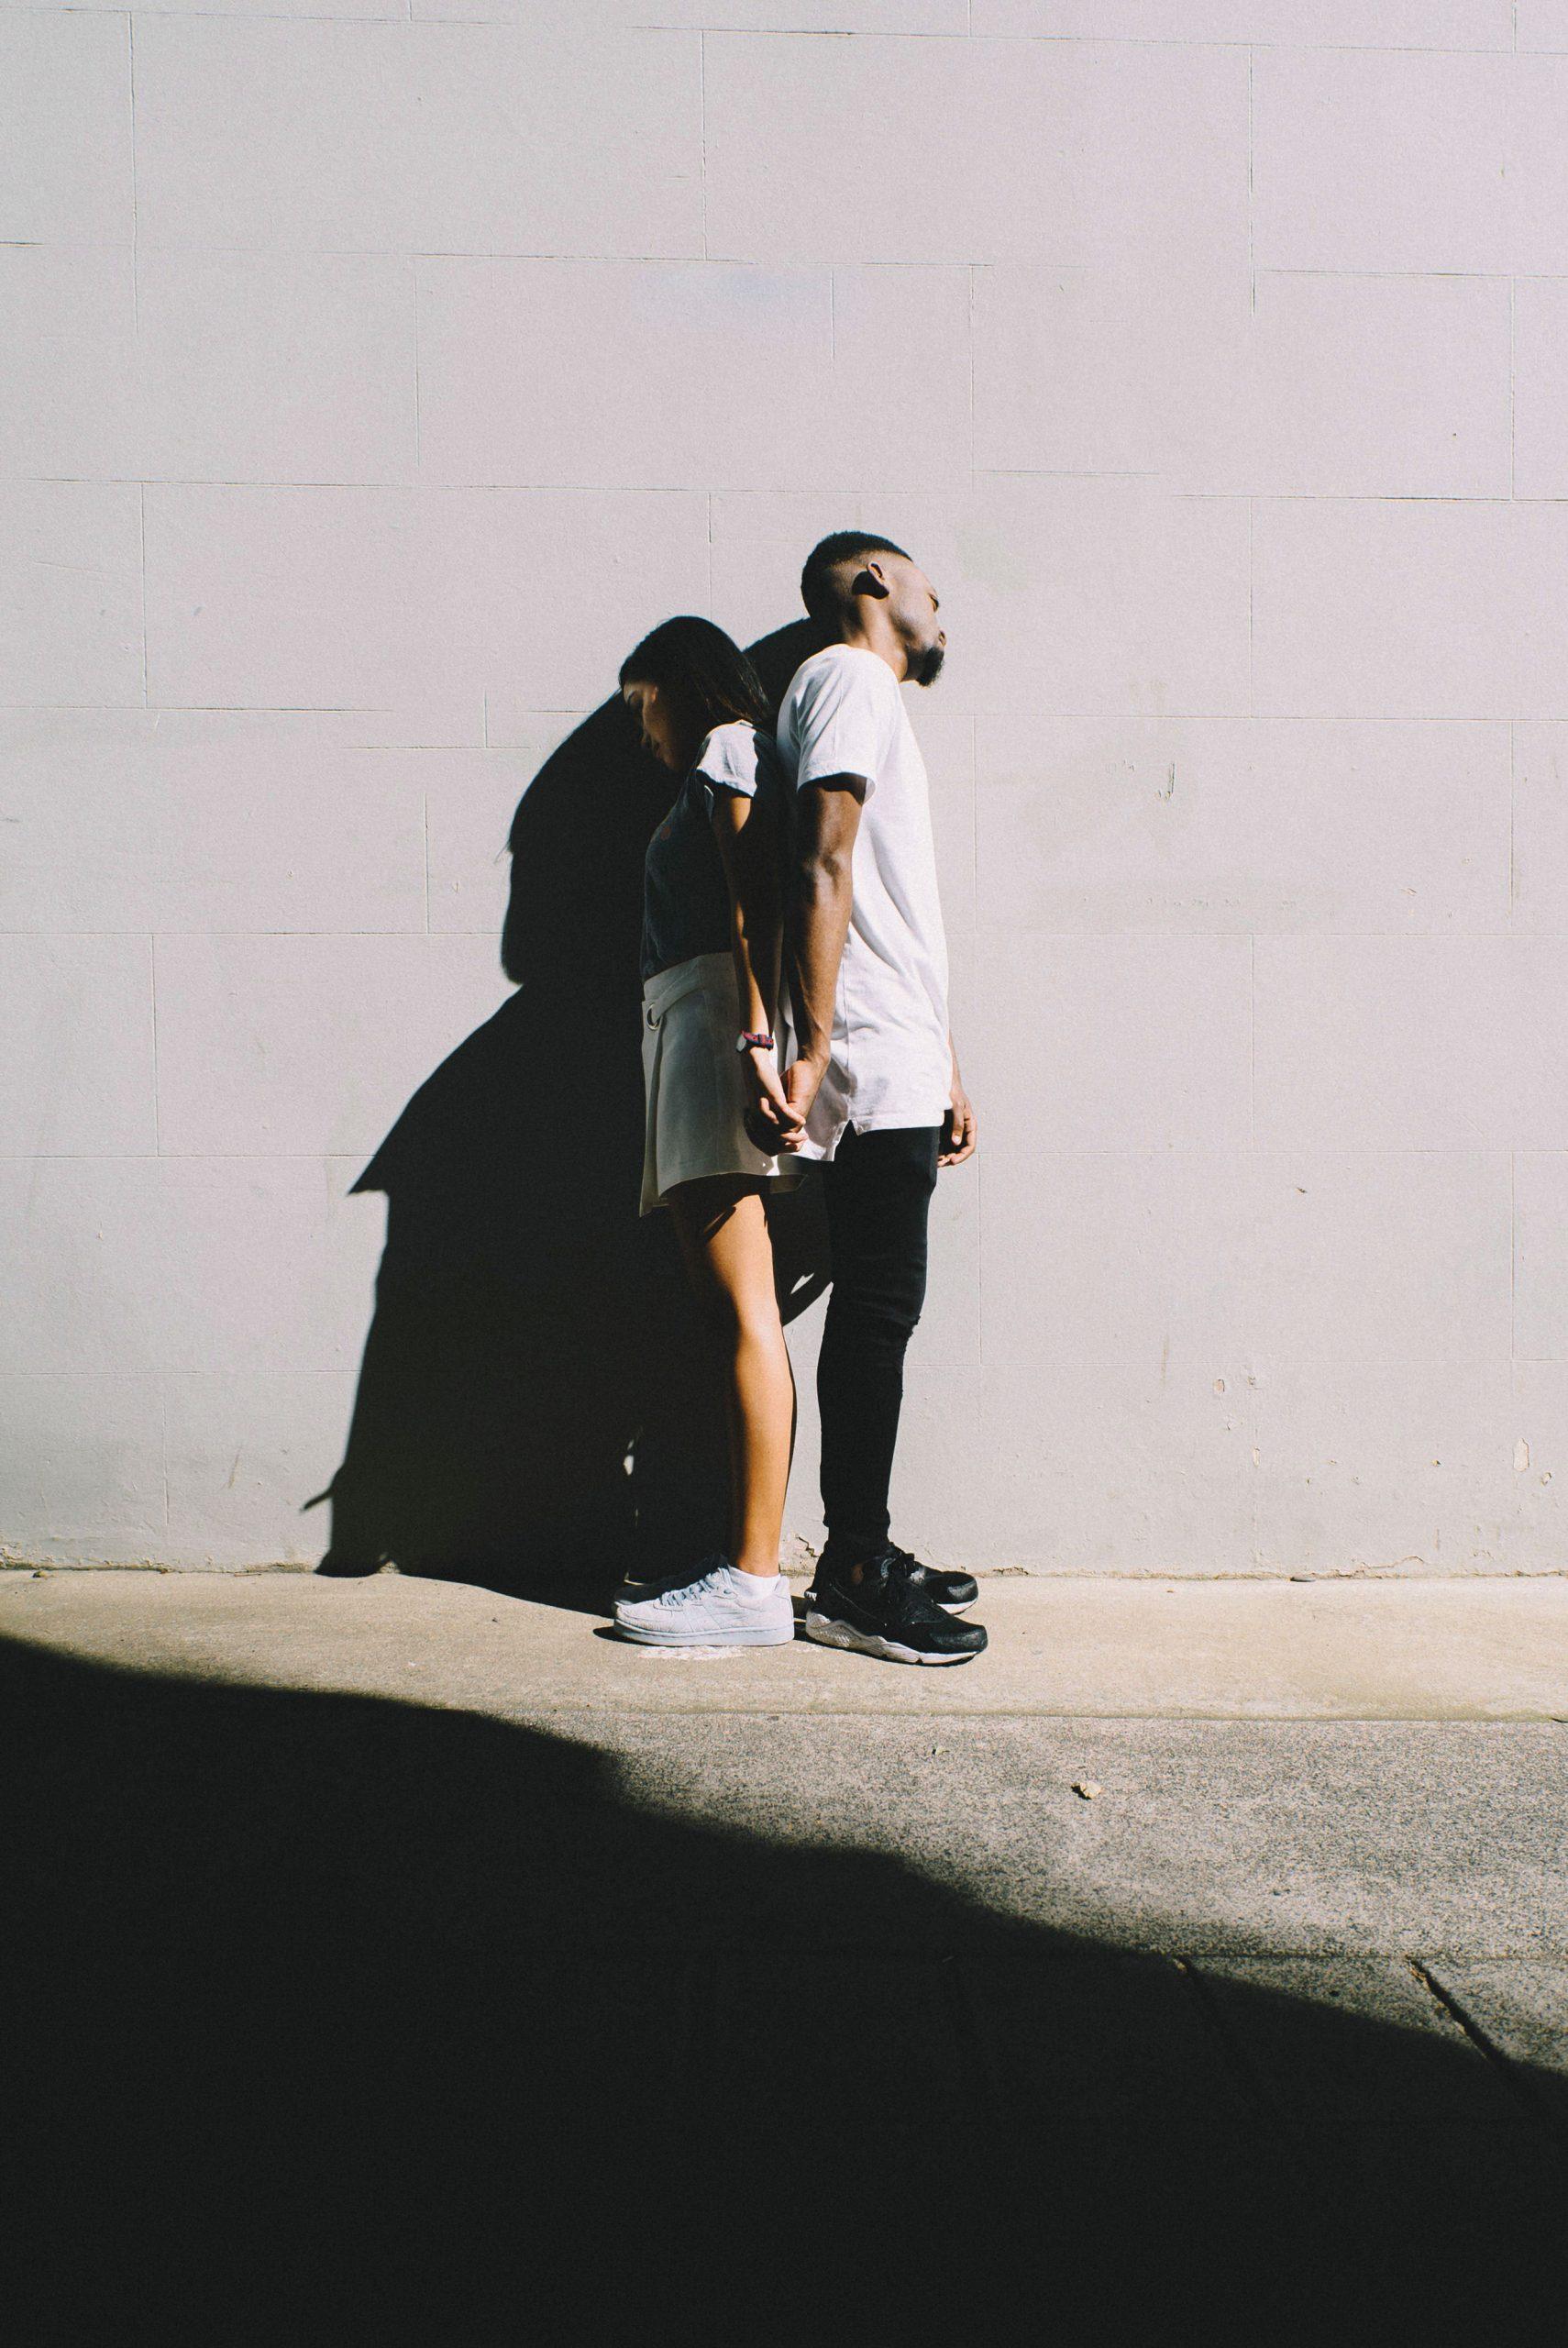 Latest Love Couple Sad Dp Images photo free download